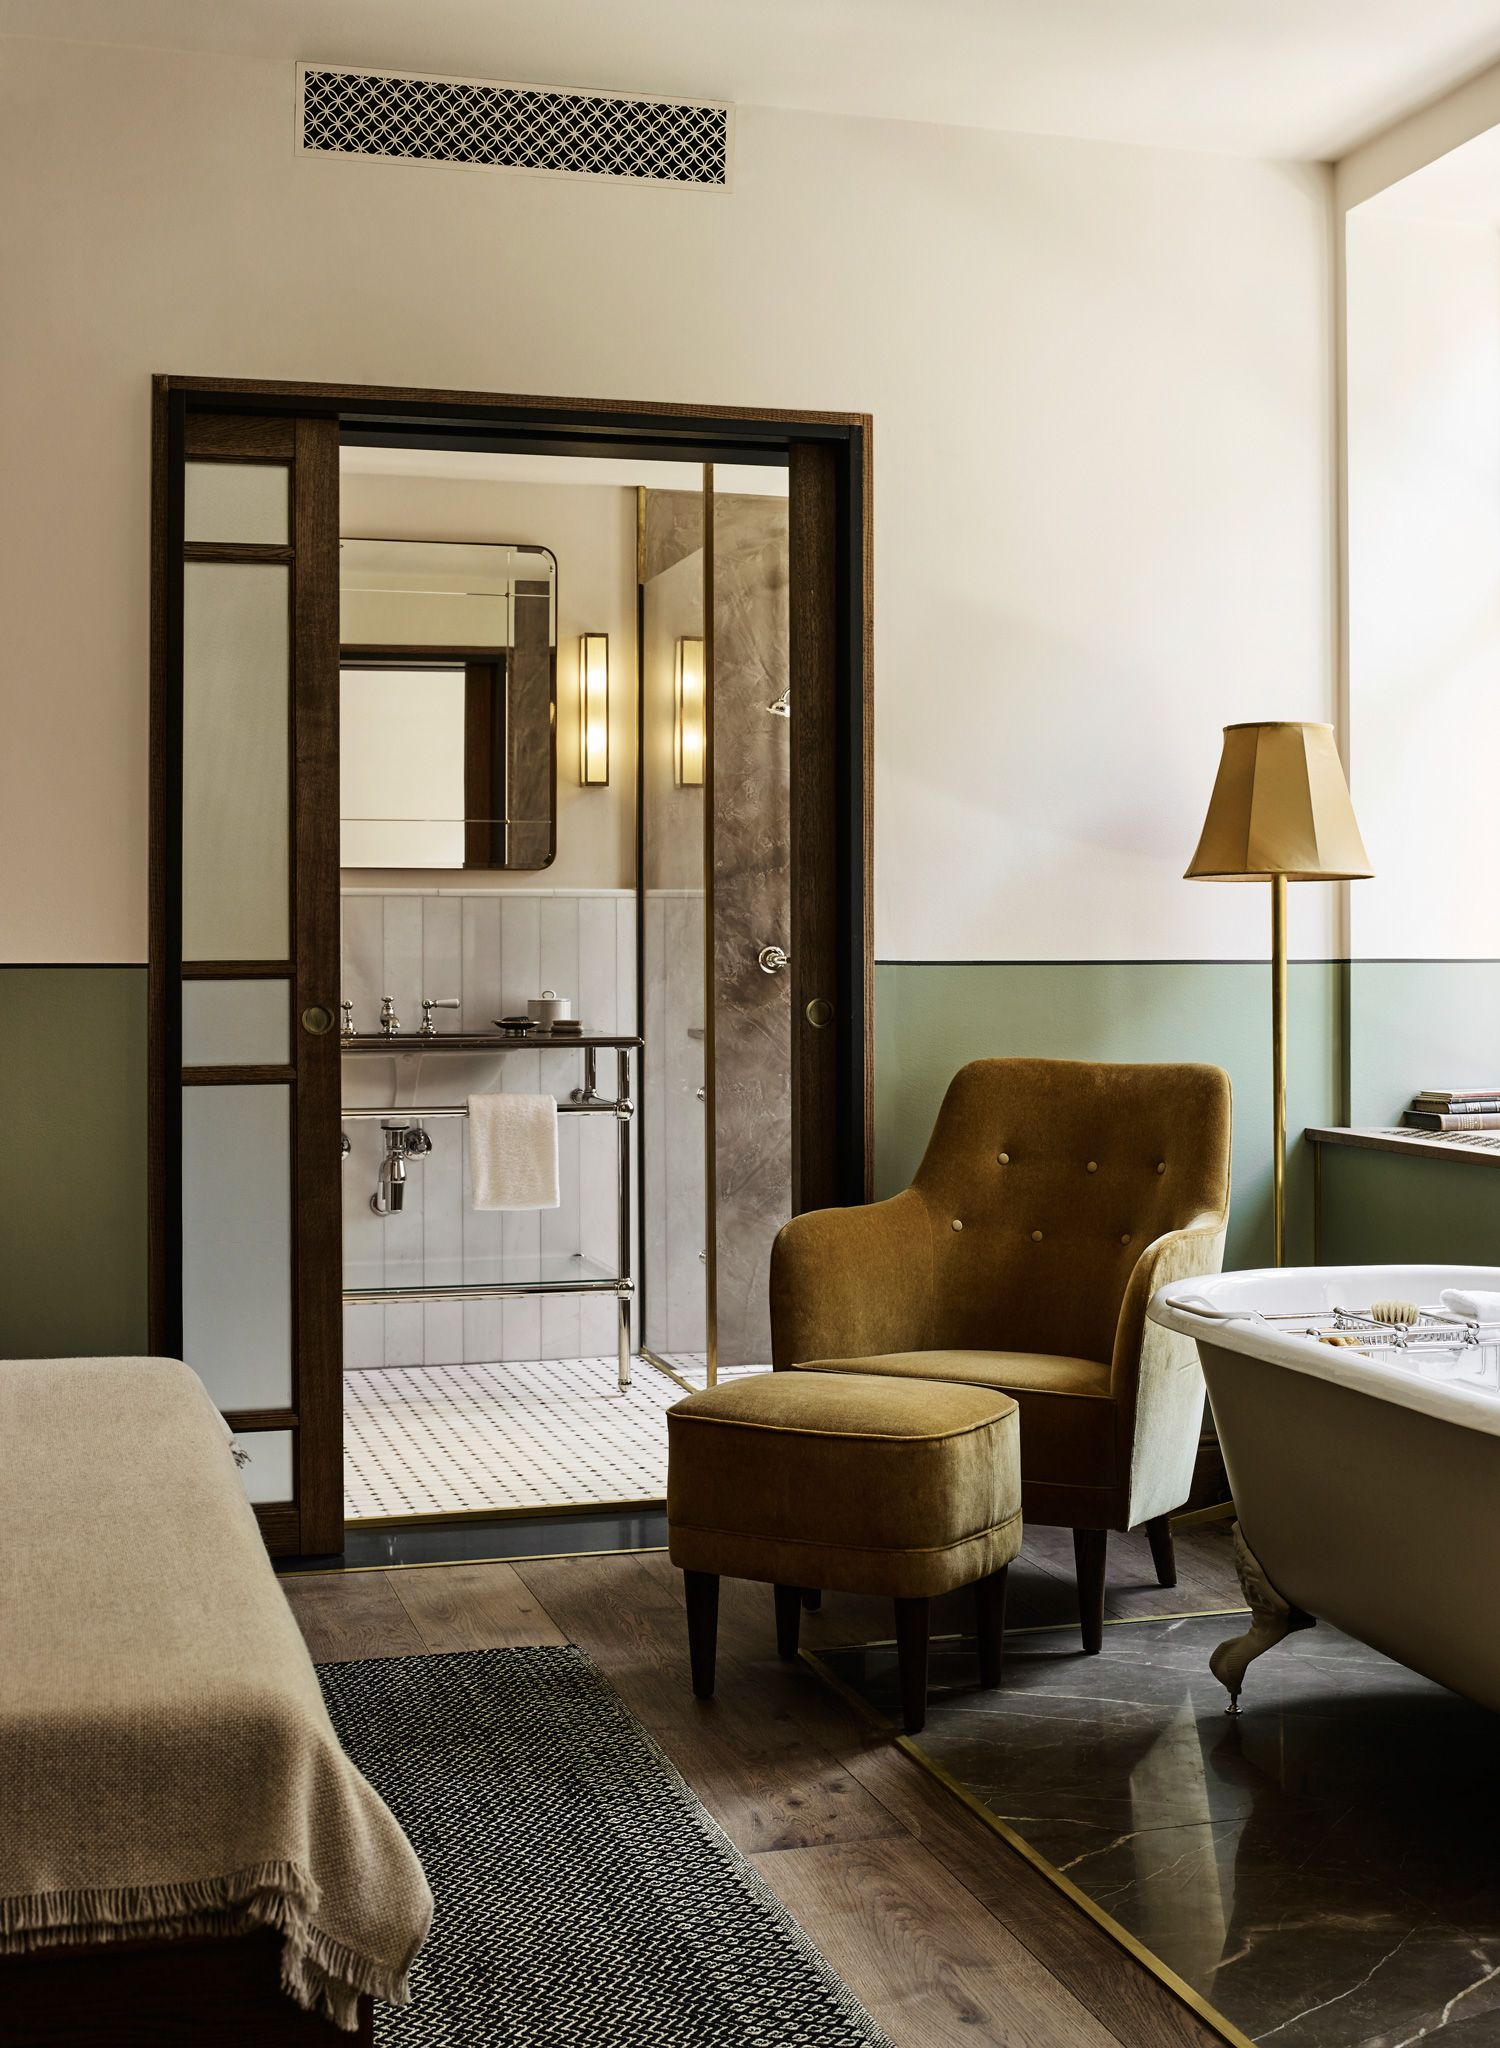 Hotel Rooms Interior Design: Sanders Boutique Hotel In Copenhagen By Lind + Almond